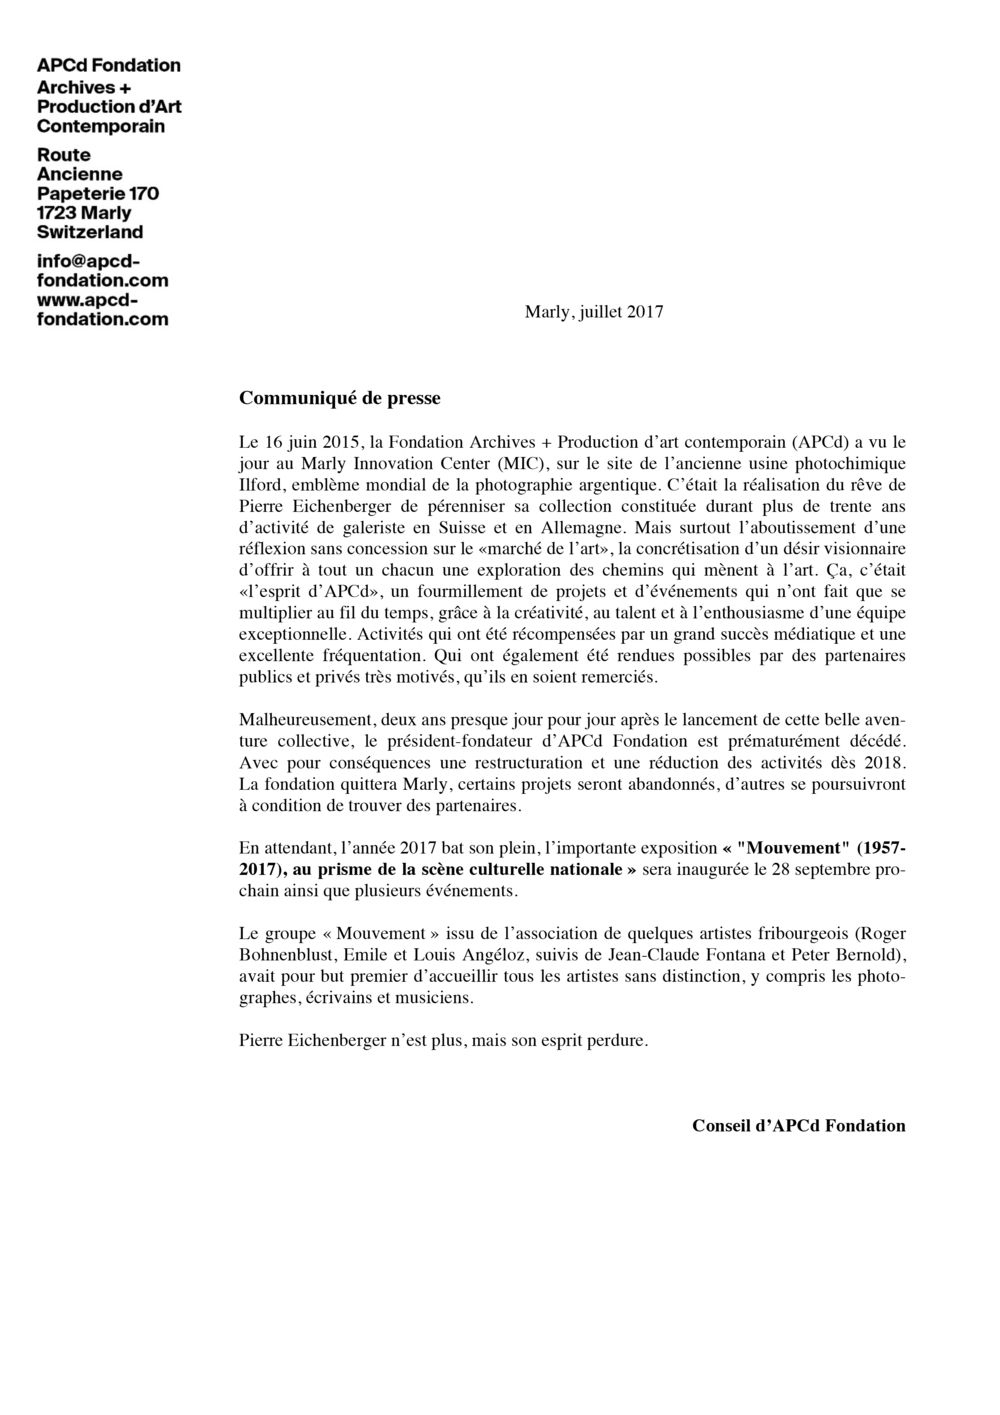 ____Communique_APCd_Fondation_Juillet_2017-1.png